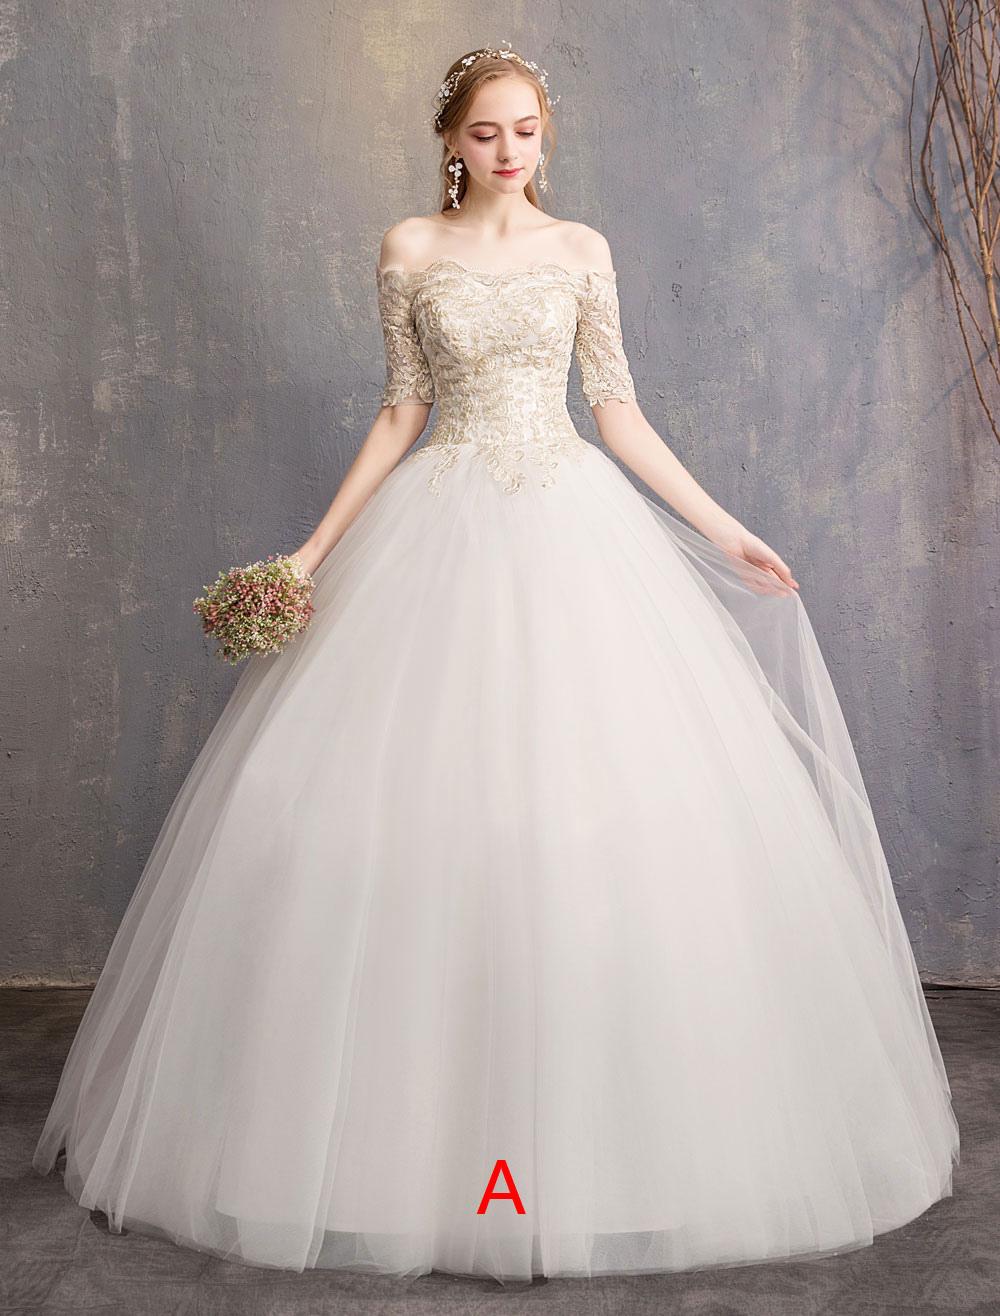 Vestido De Noiva De Tule Fora Do Ombro Meia Manga Princesa Vestido De Noiva